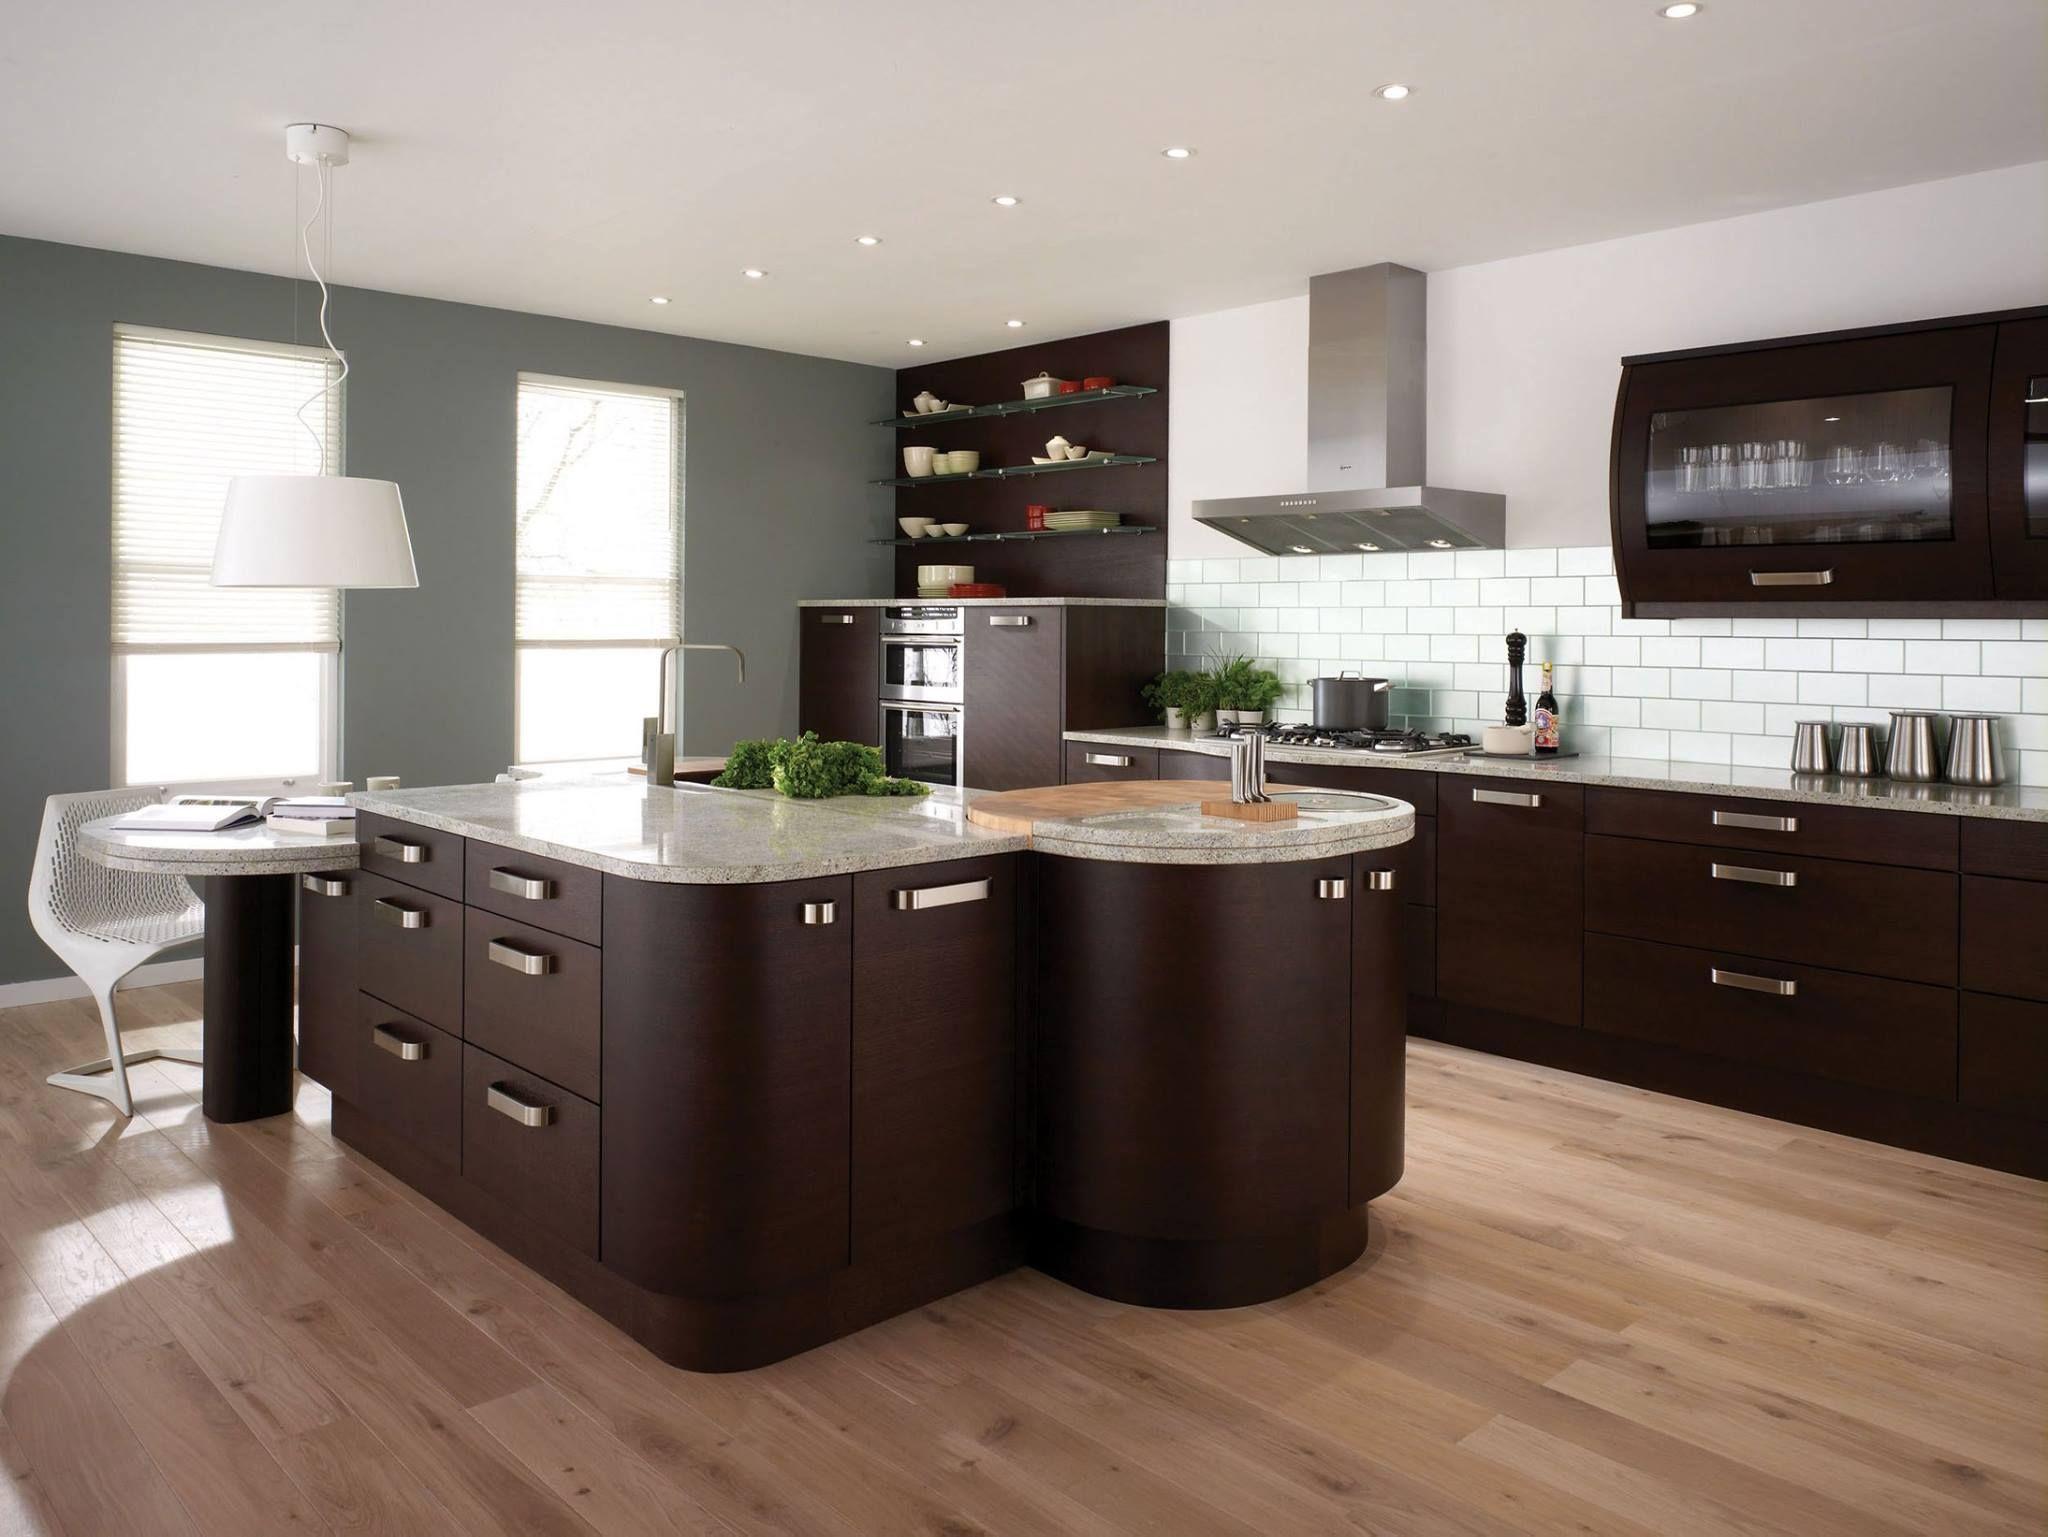 Italian Wenge Peel And Stick Kitchen Decor Modern Contemporary Kitchen Design Kitchen Cabinet Design